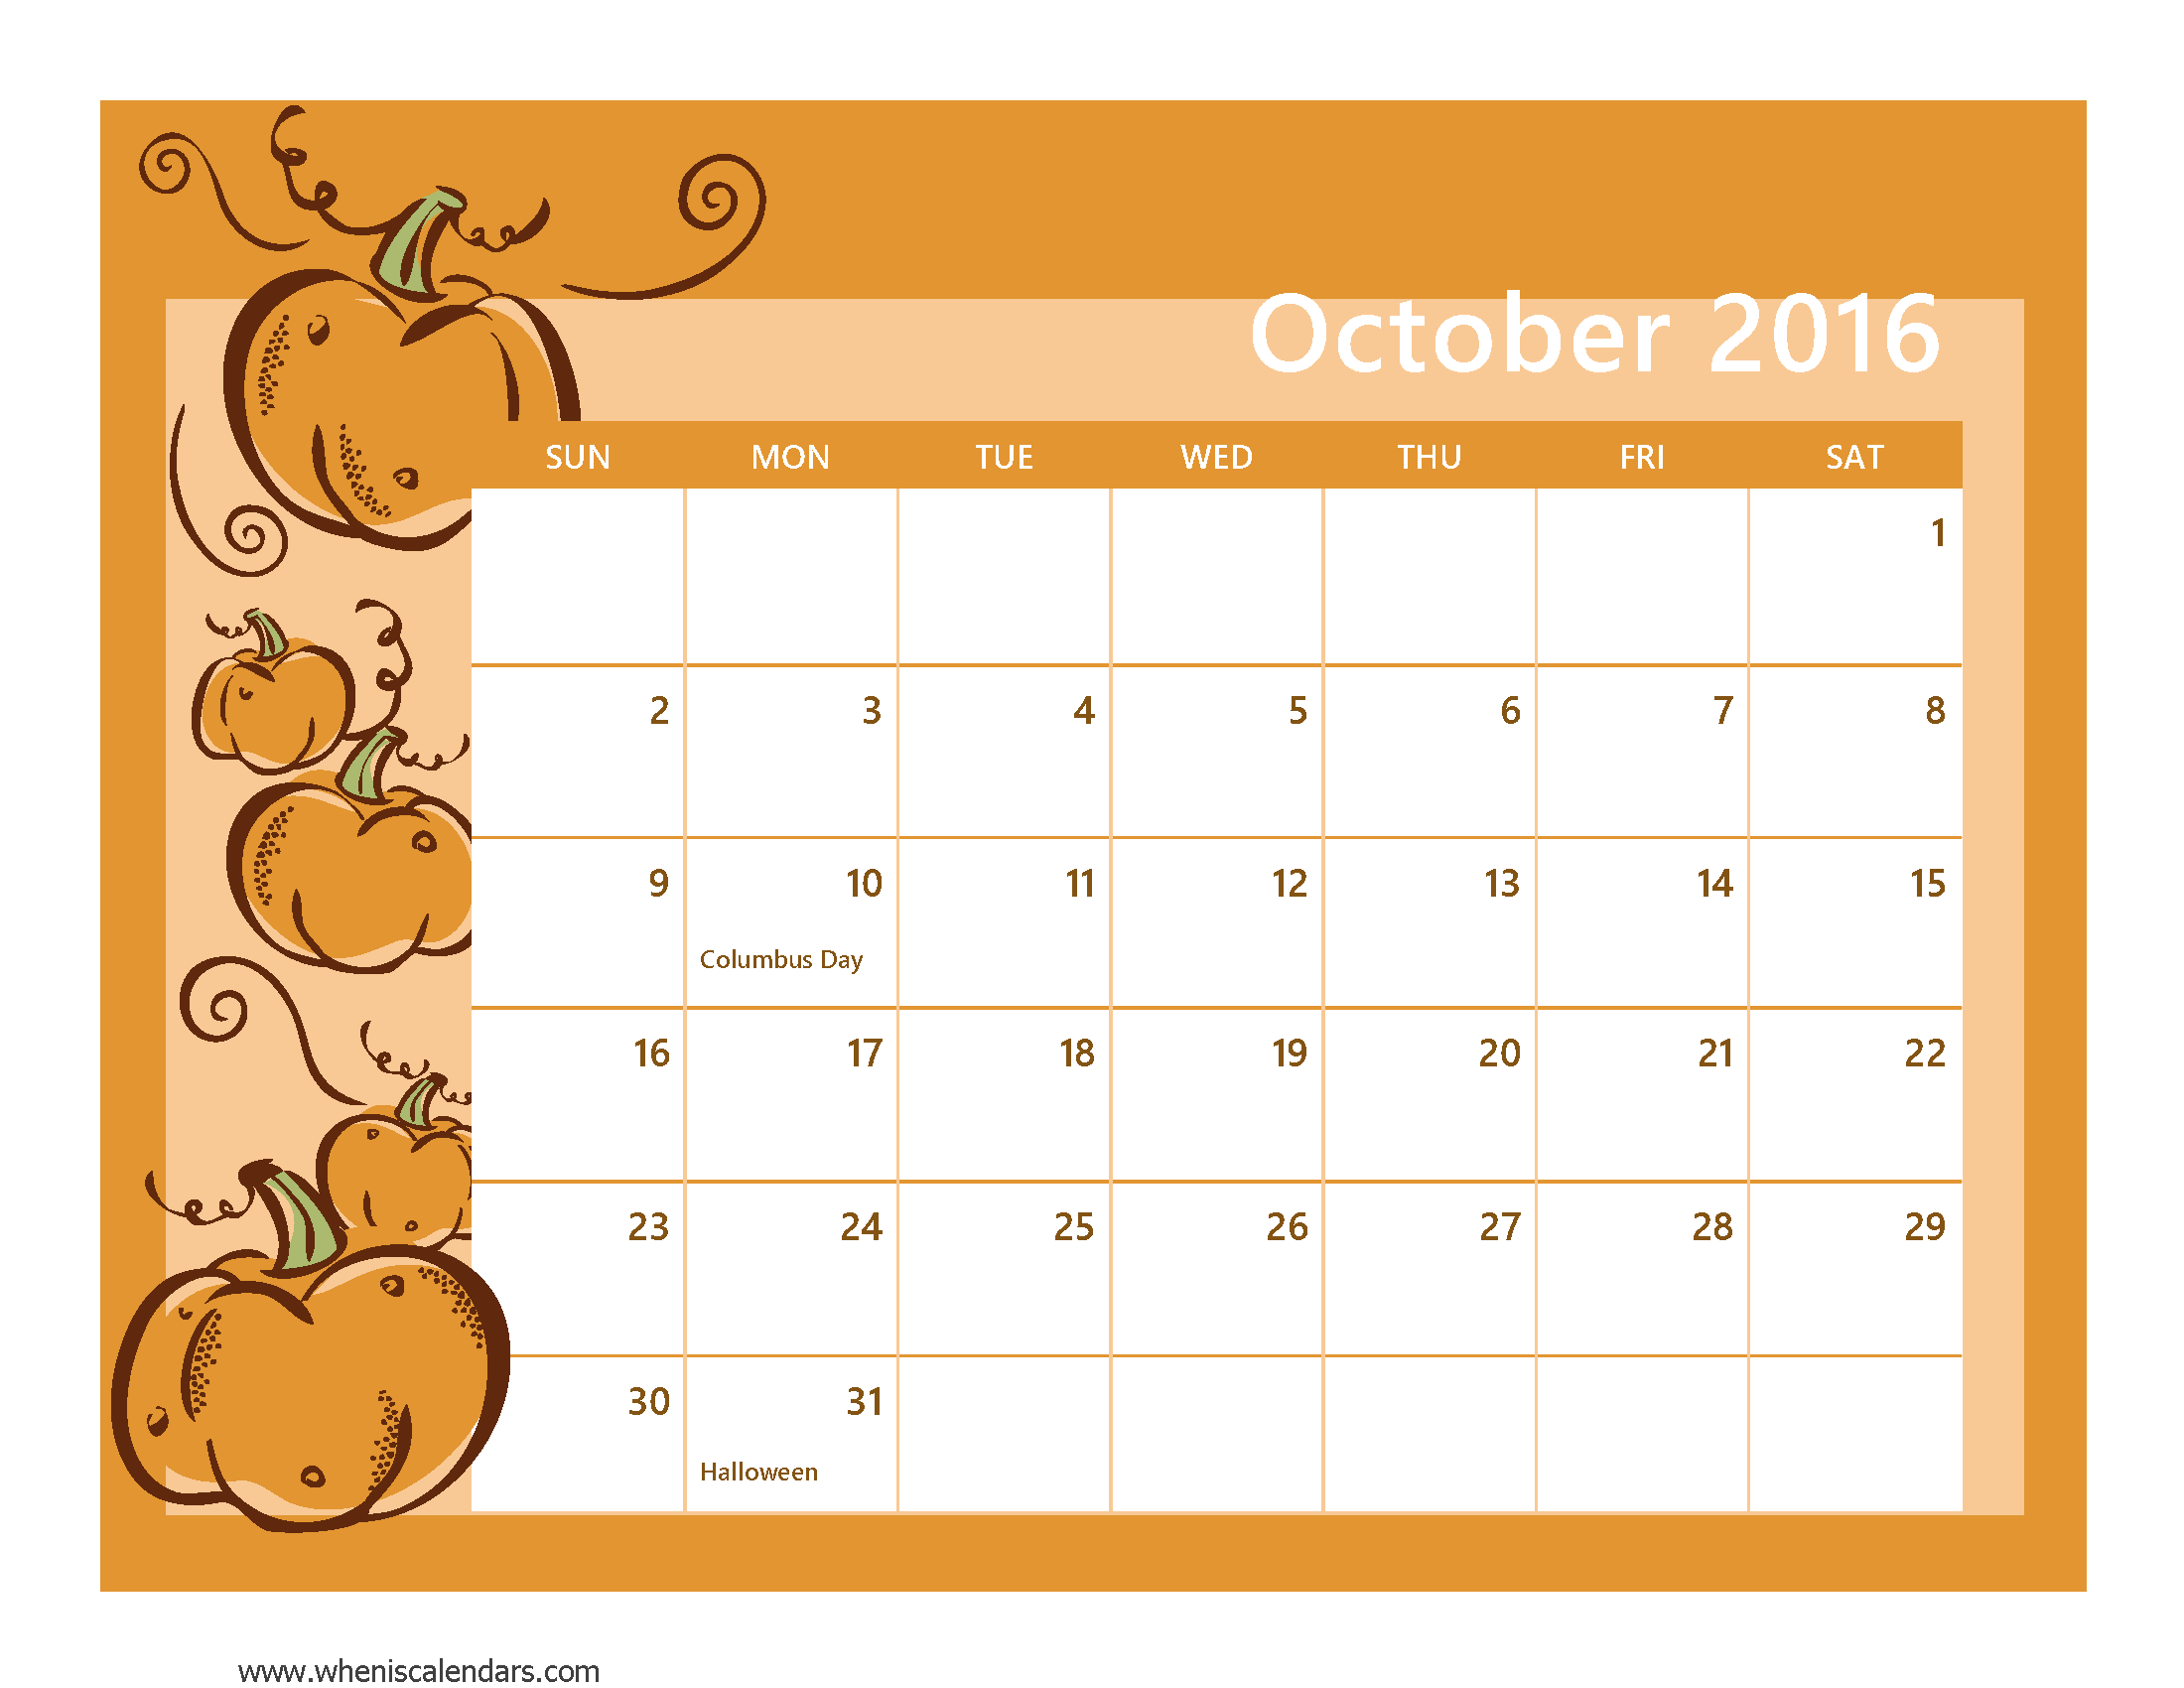 Blank incep imagine ex. Calendar clipart calender